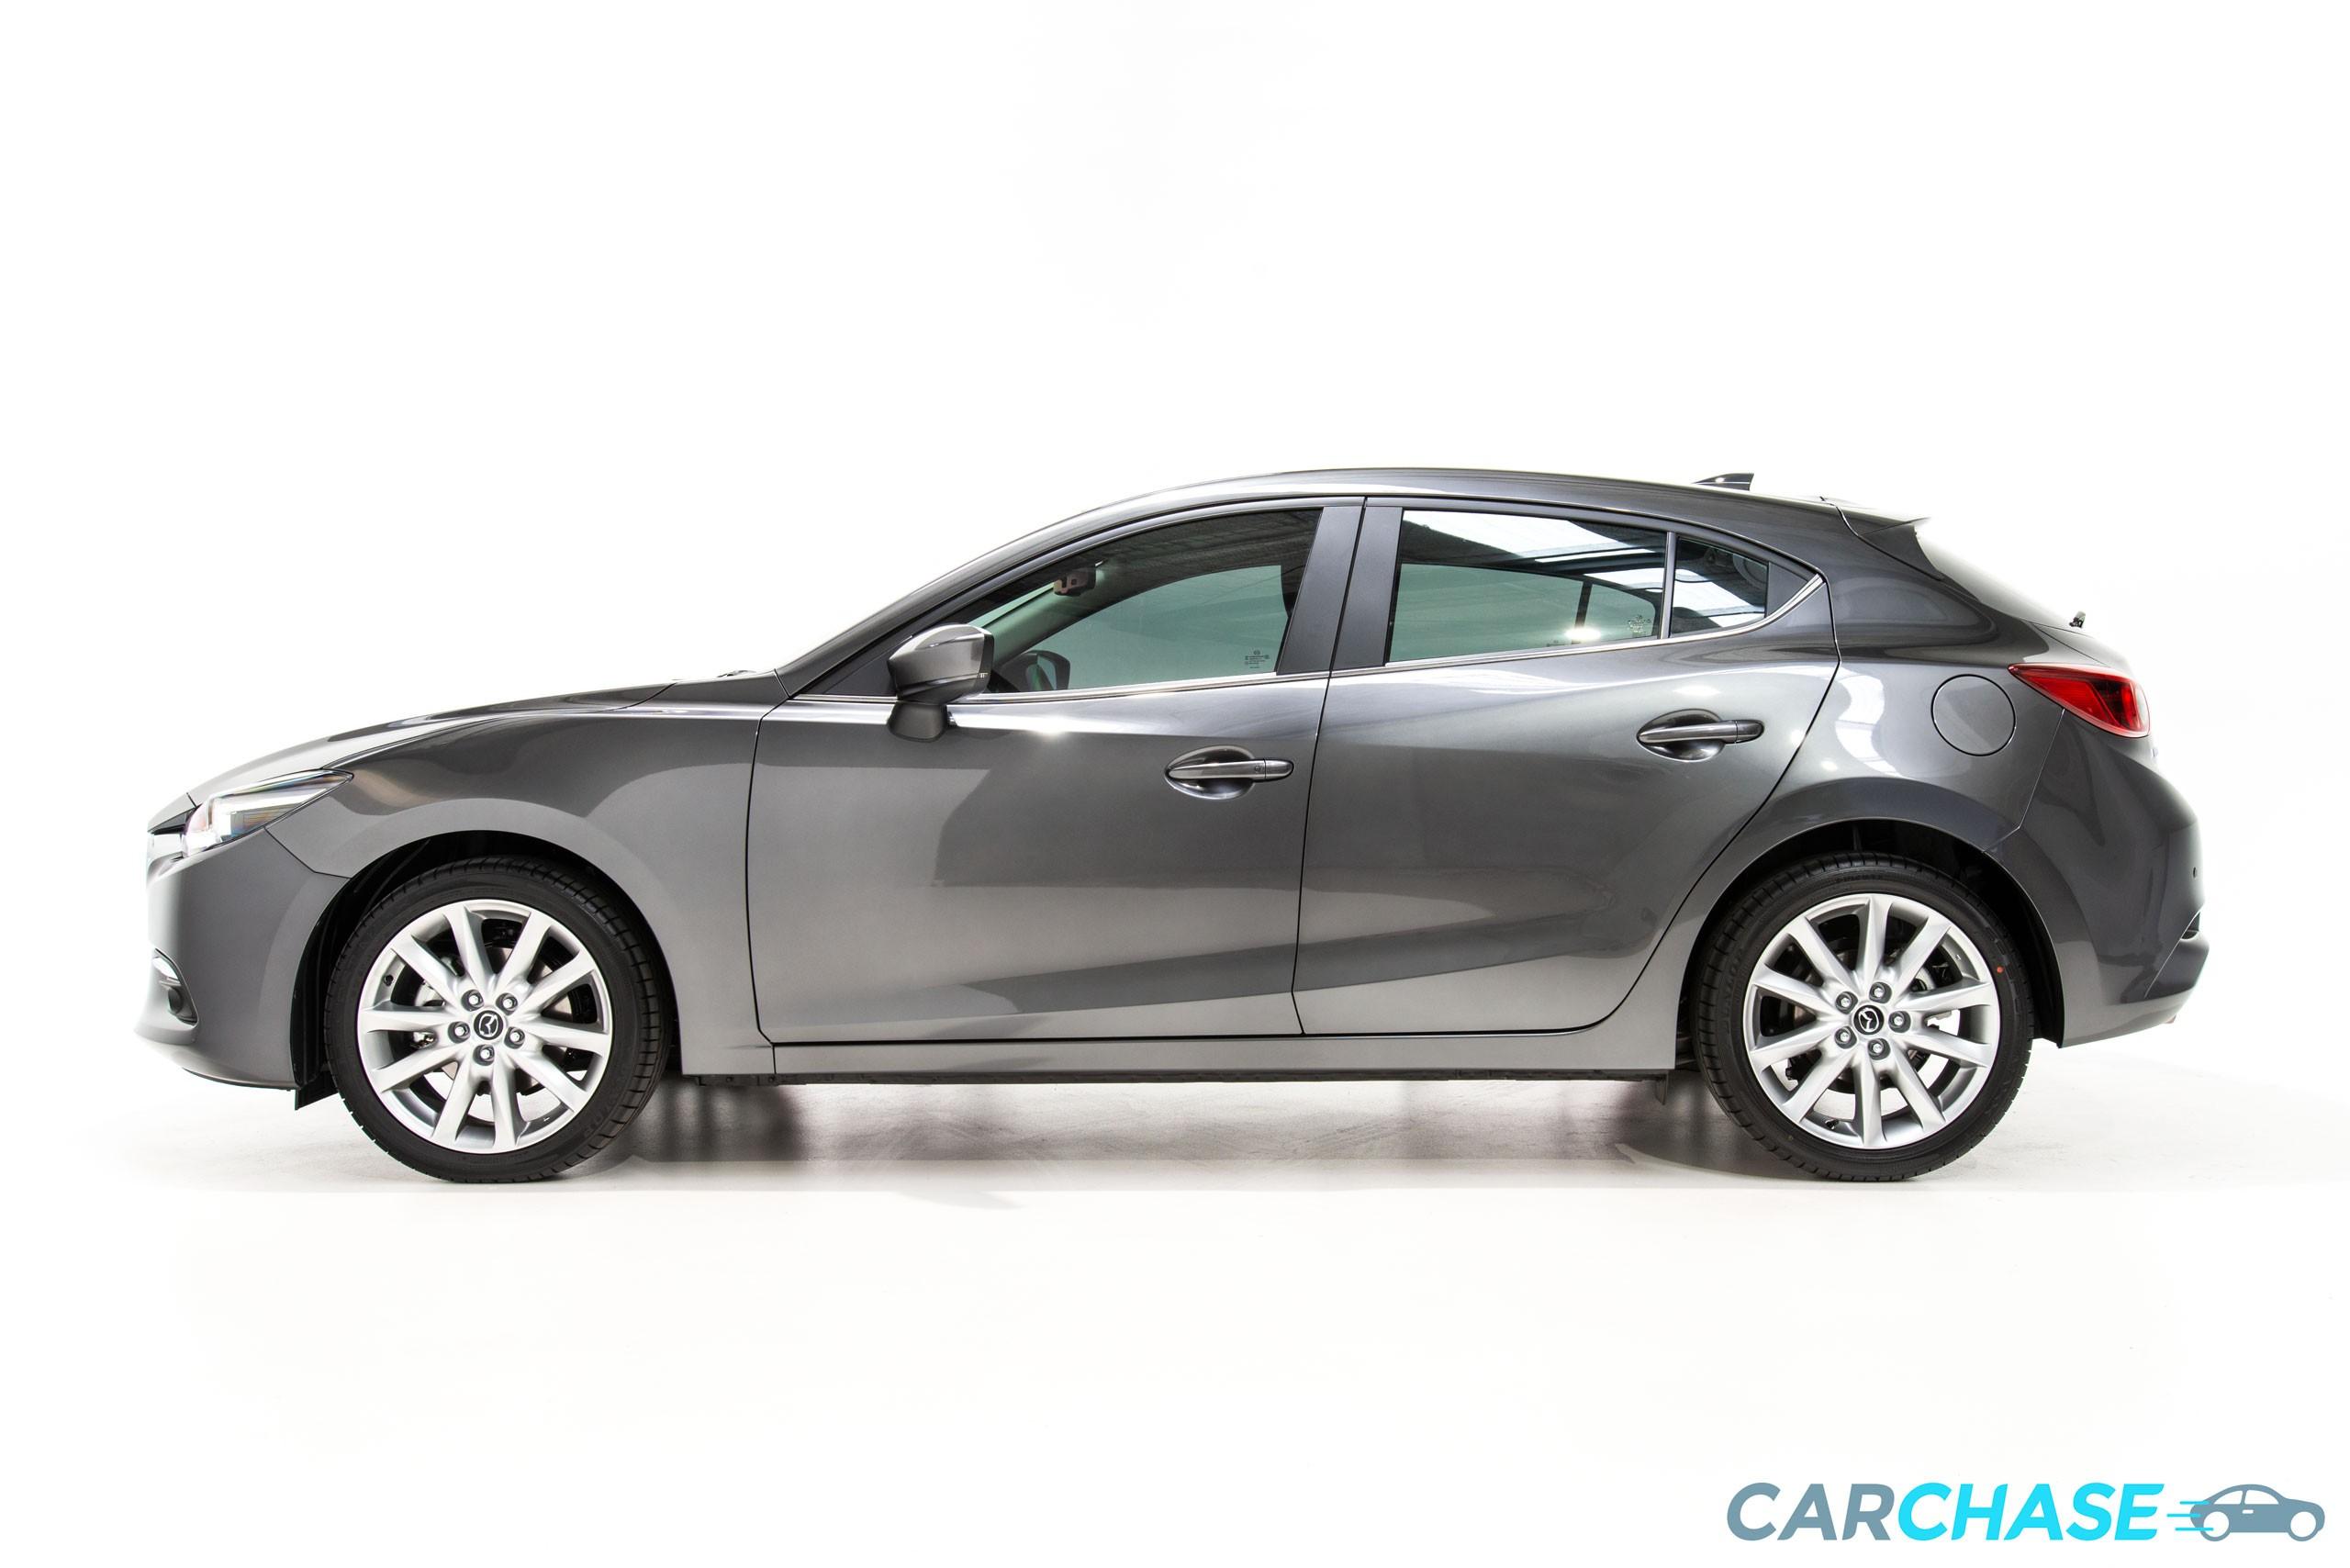 Image of left profile of 2018 Mazda 3 SP25 GT